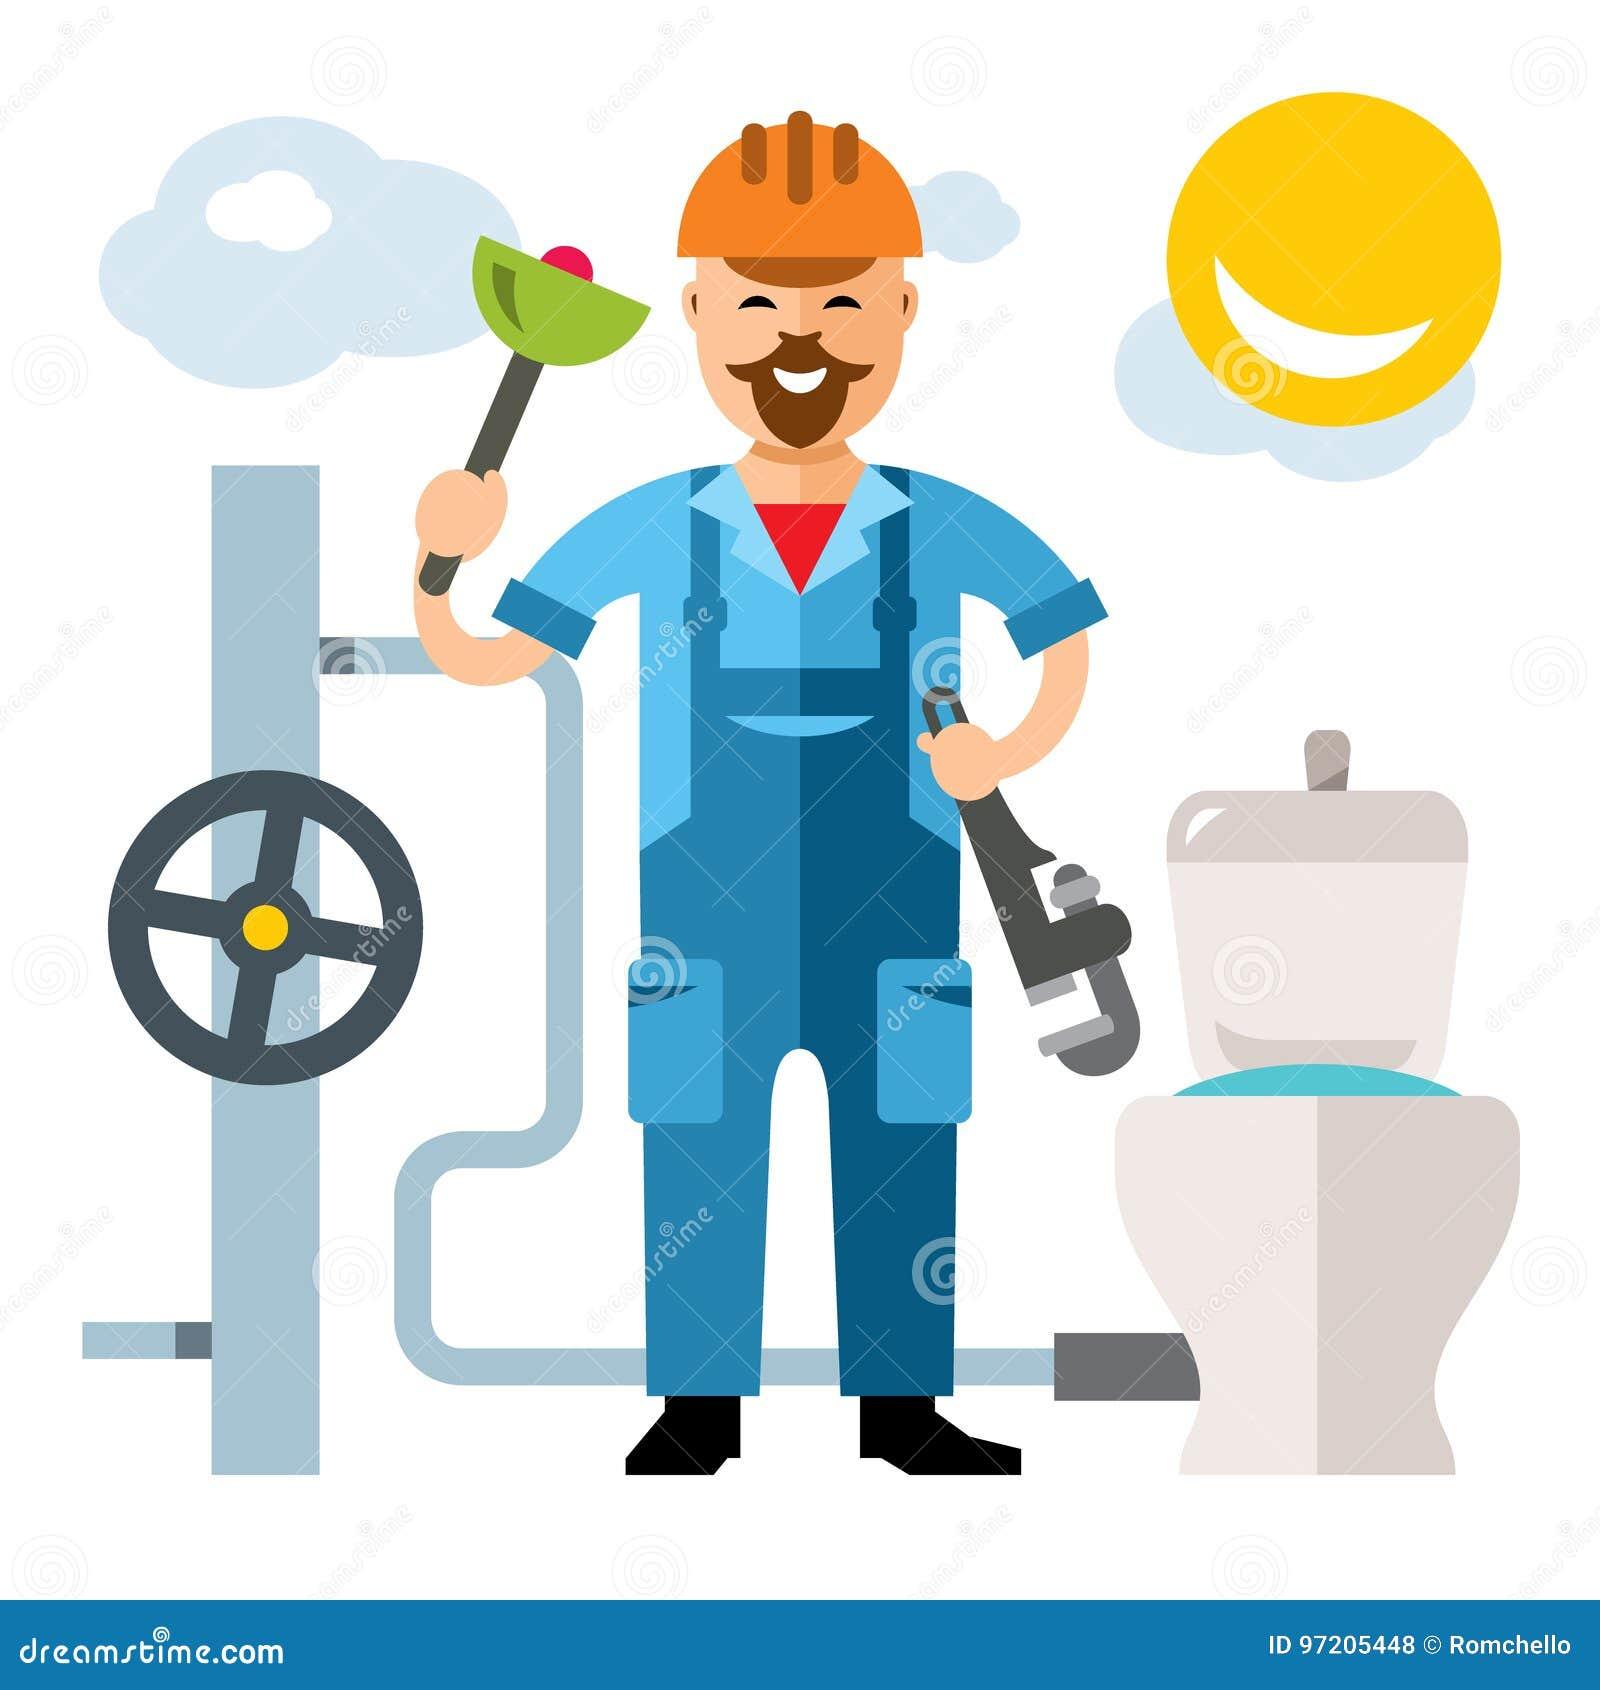 Vector illustration of an happy plumber cartoon